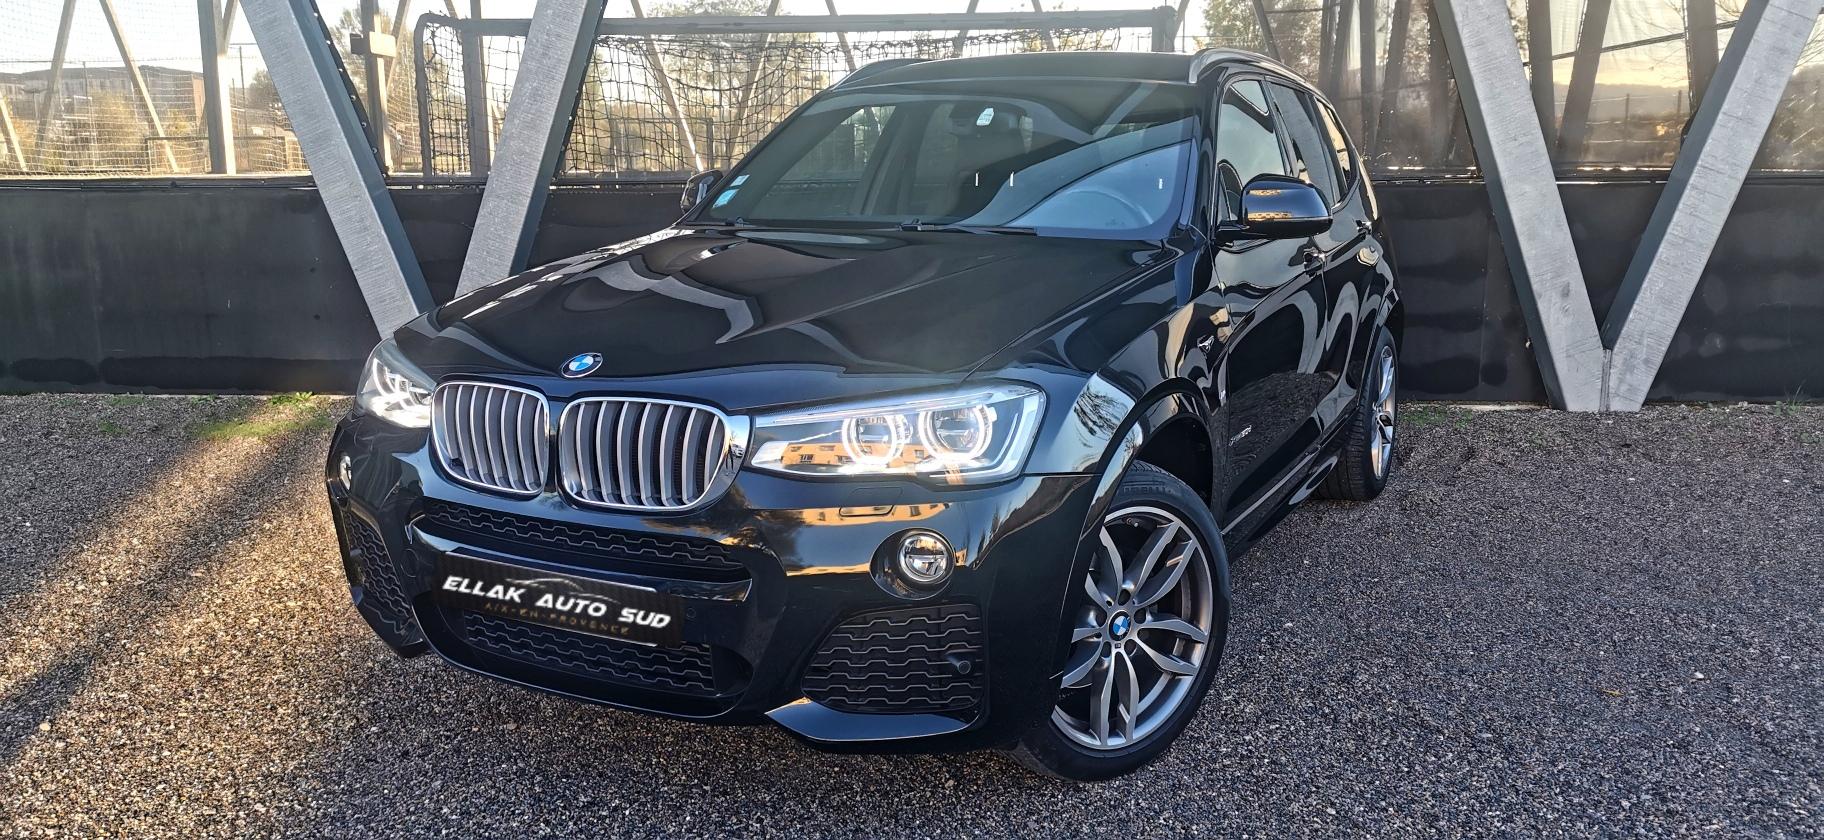 BMW X3 - Ellak Auto Sud